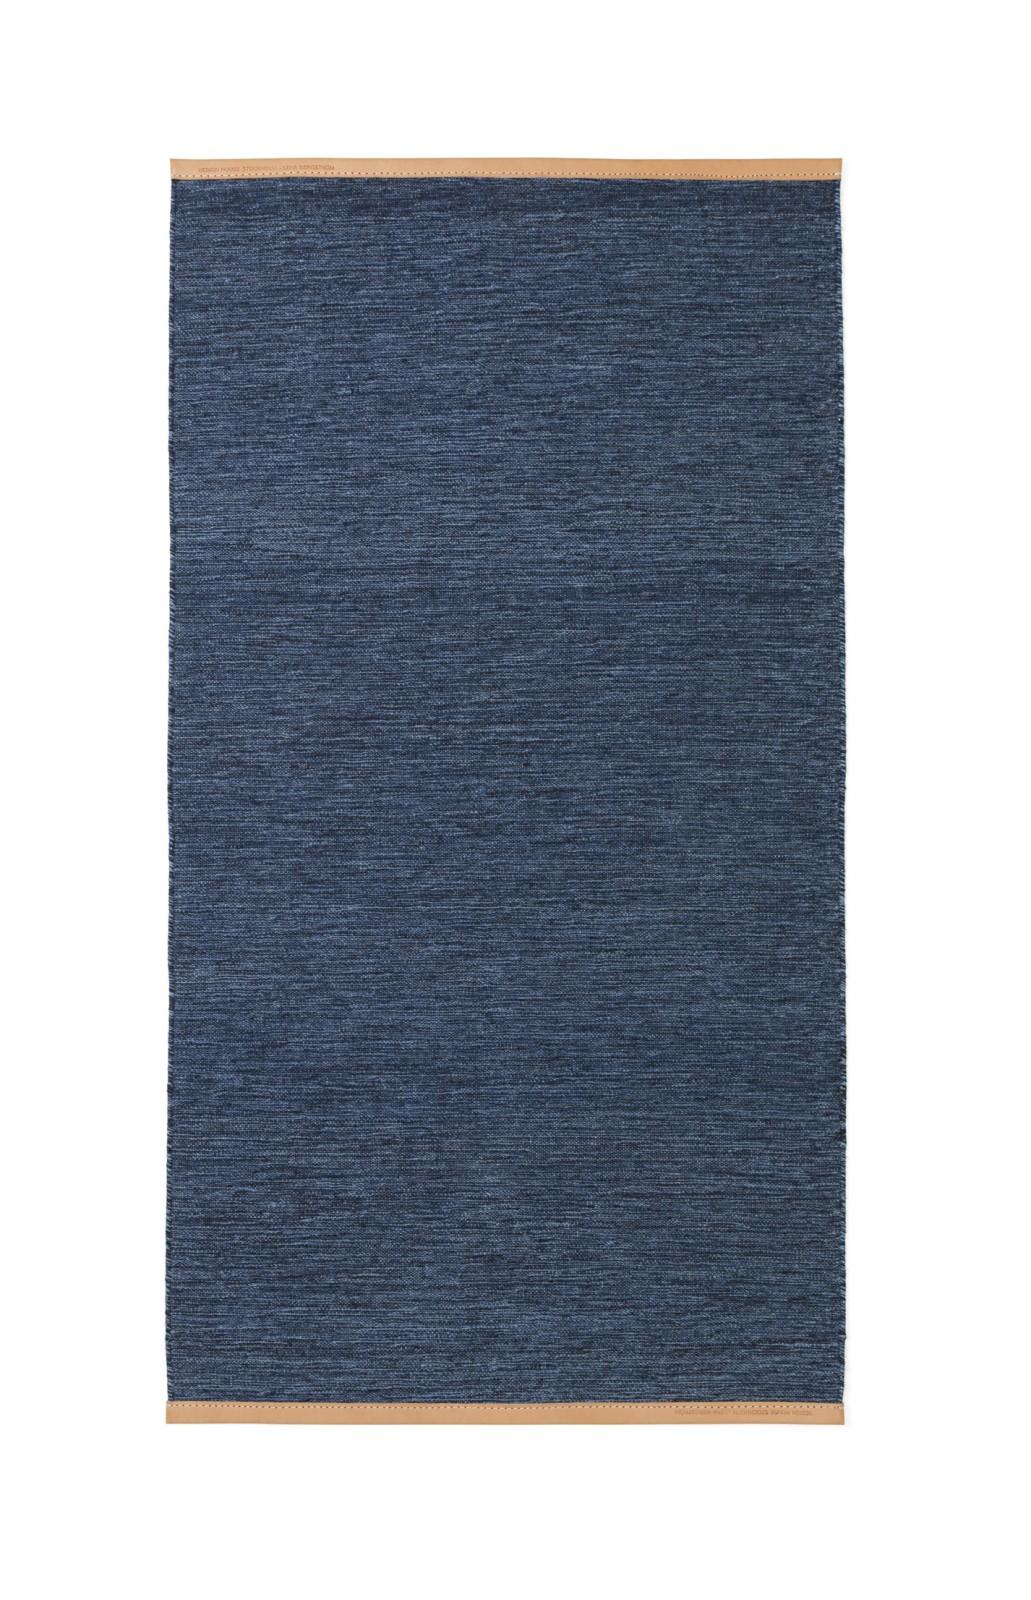 Björk Long Rug Blue, 70x130 cm